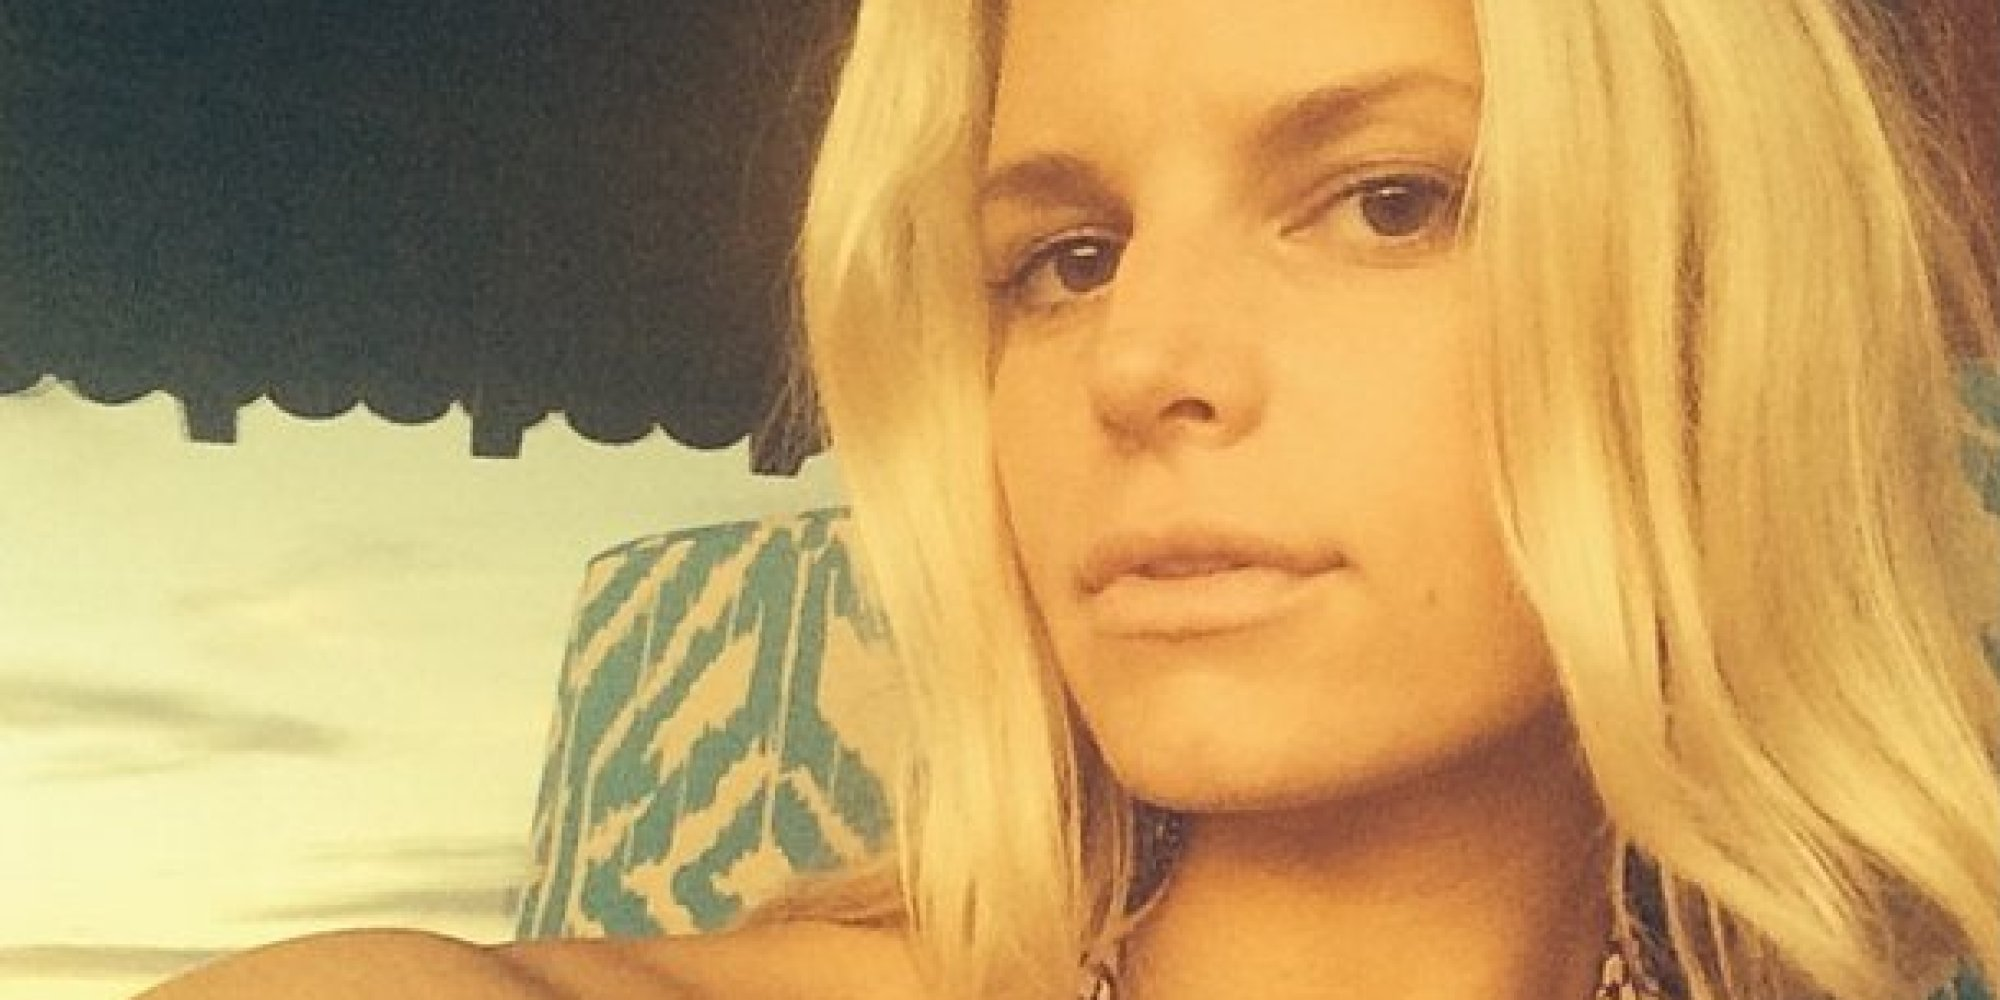 Jessica Simpson Celebrates 34th Birthday With No Makeup Selfie